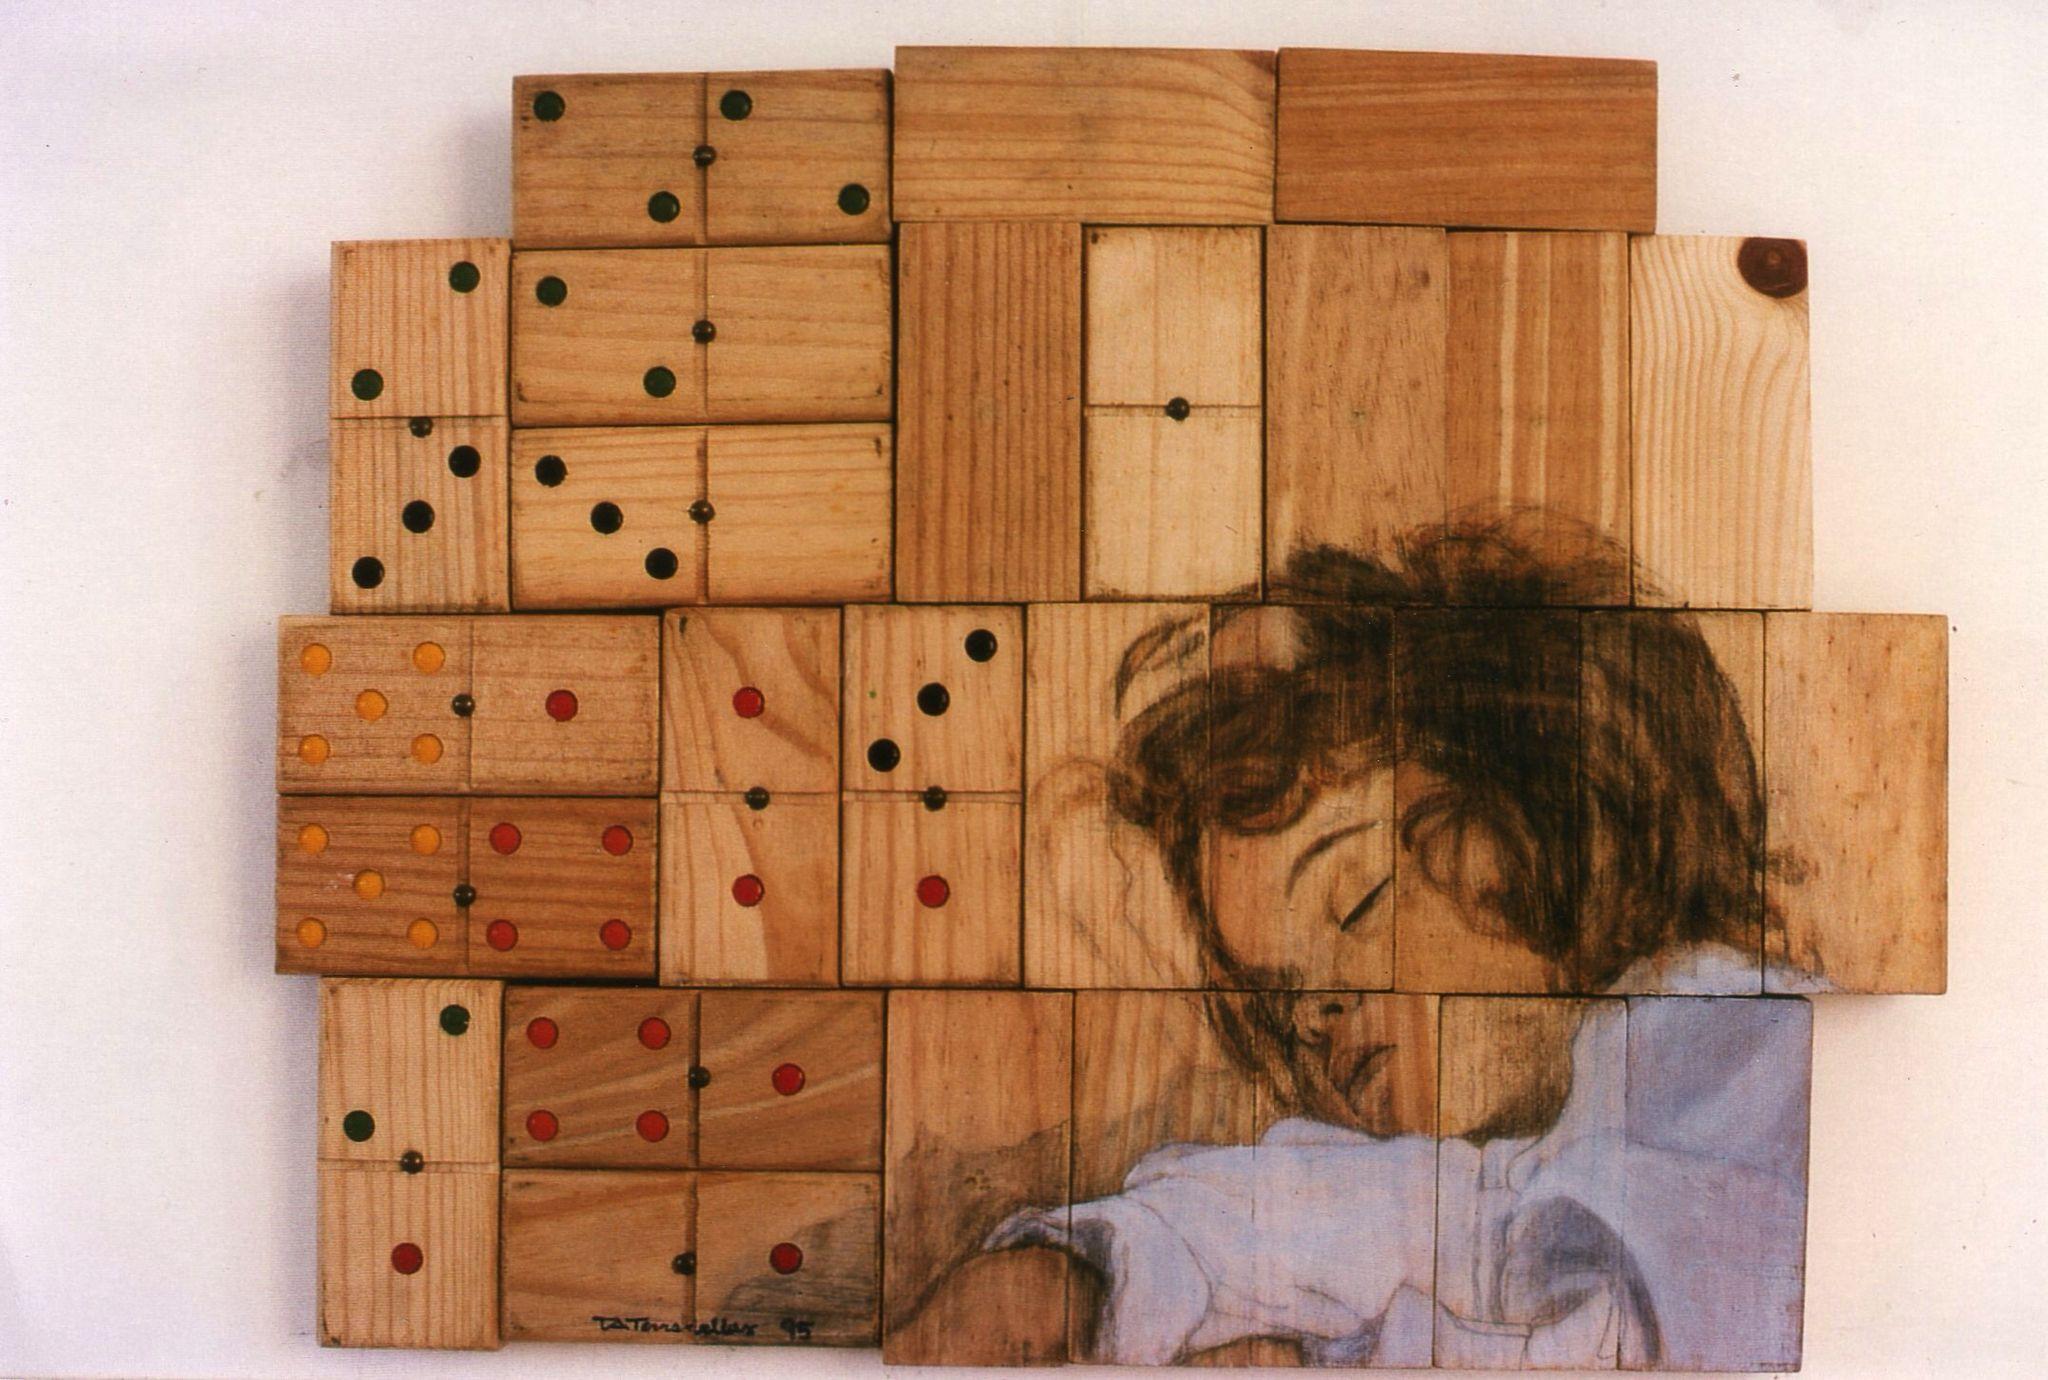 Domino by Carlota Delgar. Nens/Children/ infants from Catalunya.